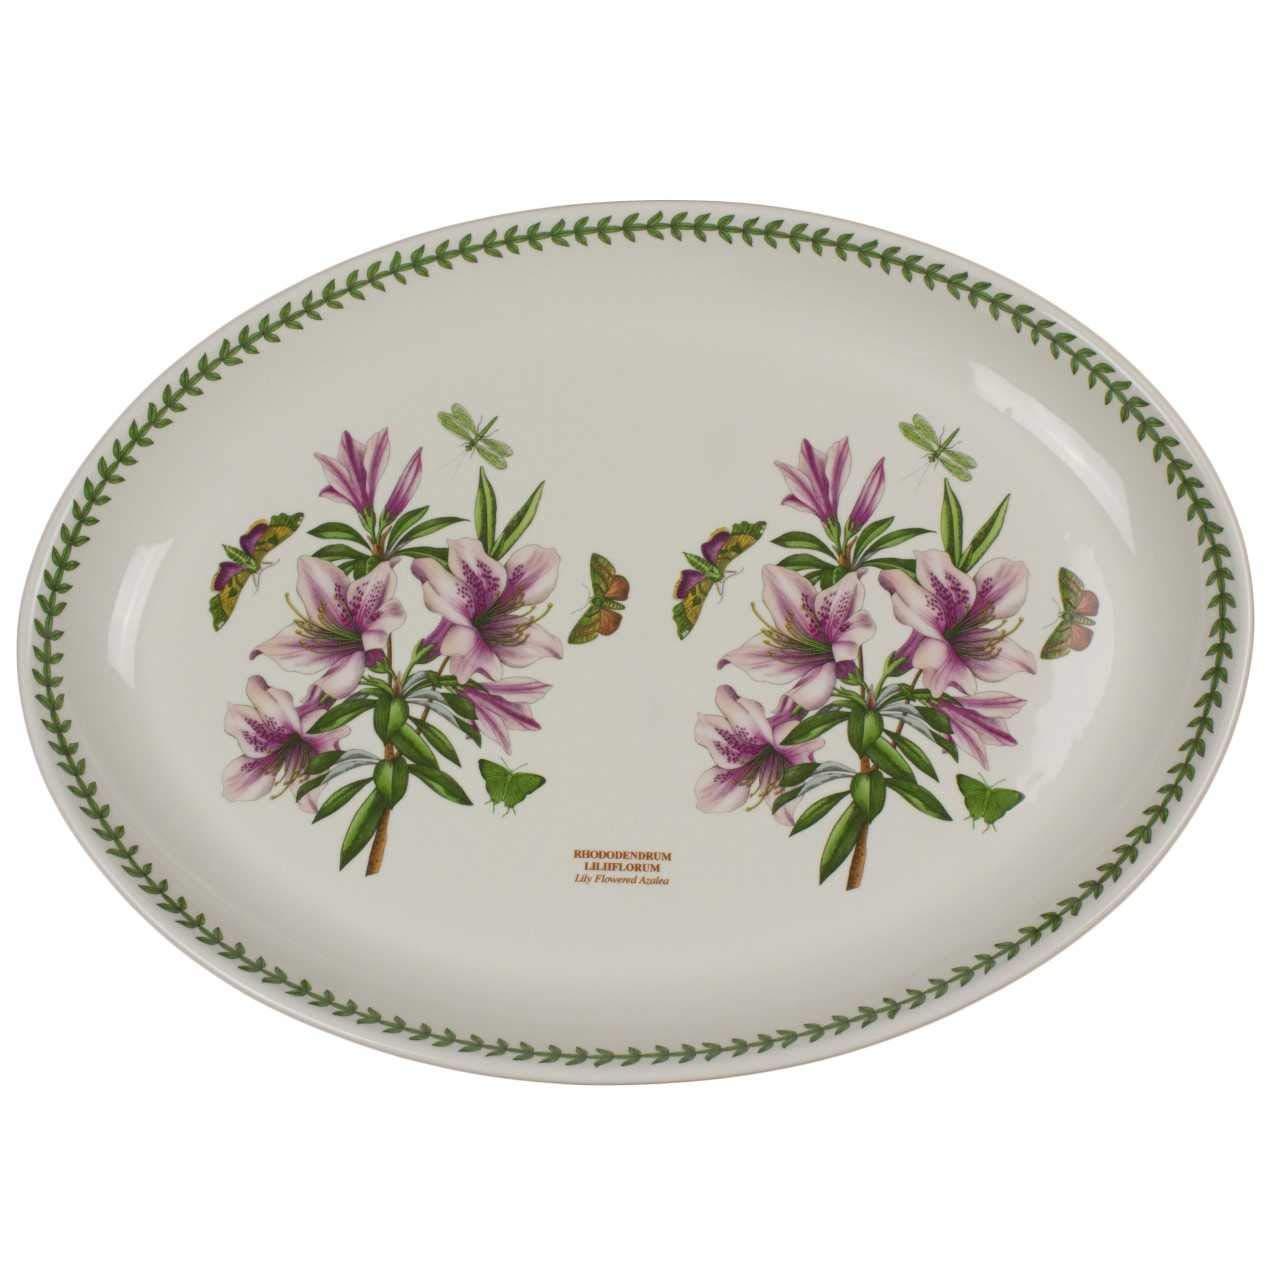 Portmeirion Botanic Garden Turkey Platter Azalea Buy Online In Bahamas At Bahamas Desertcart Com Productid 42030575